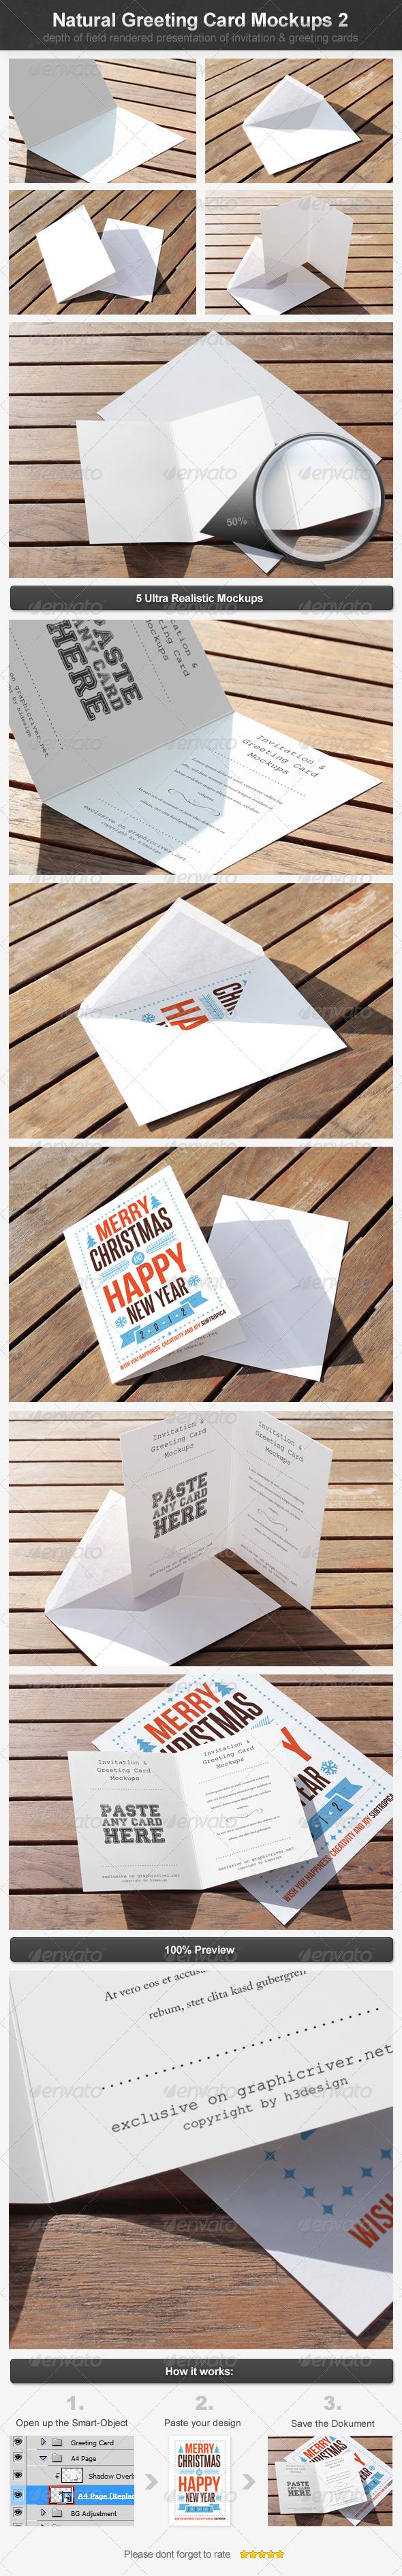 GraphicRiver Natural Greeting Card Mockups 2 4216178